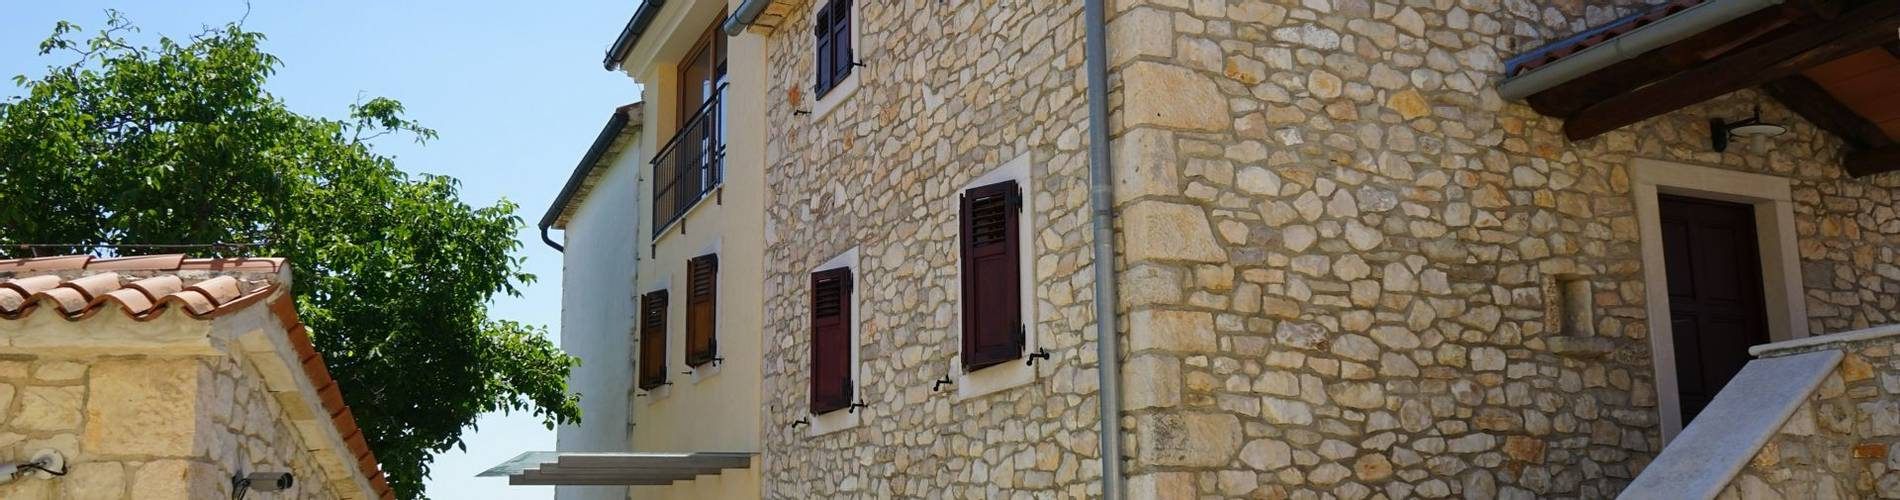 Heritage Hotel San Rocco, Istra, Croatia (2).JPG